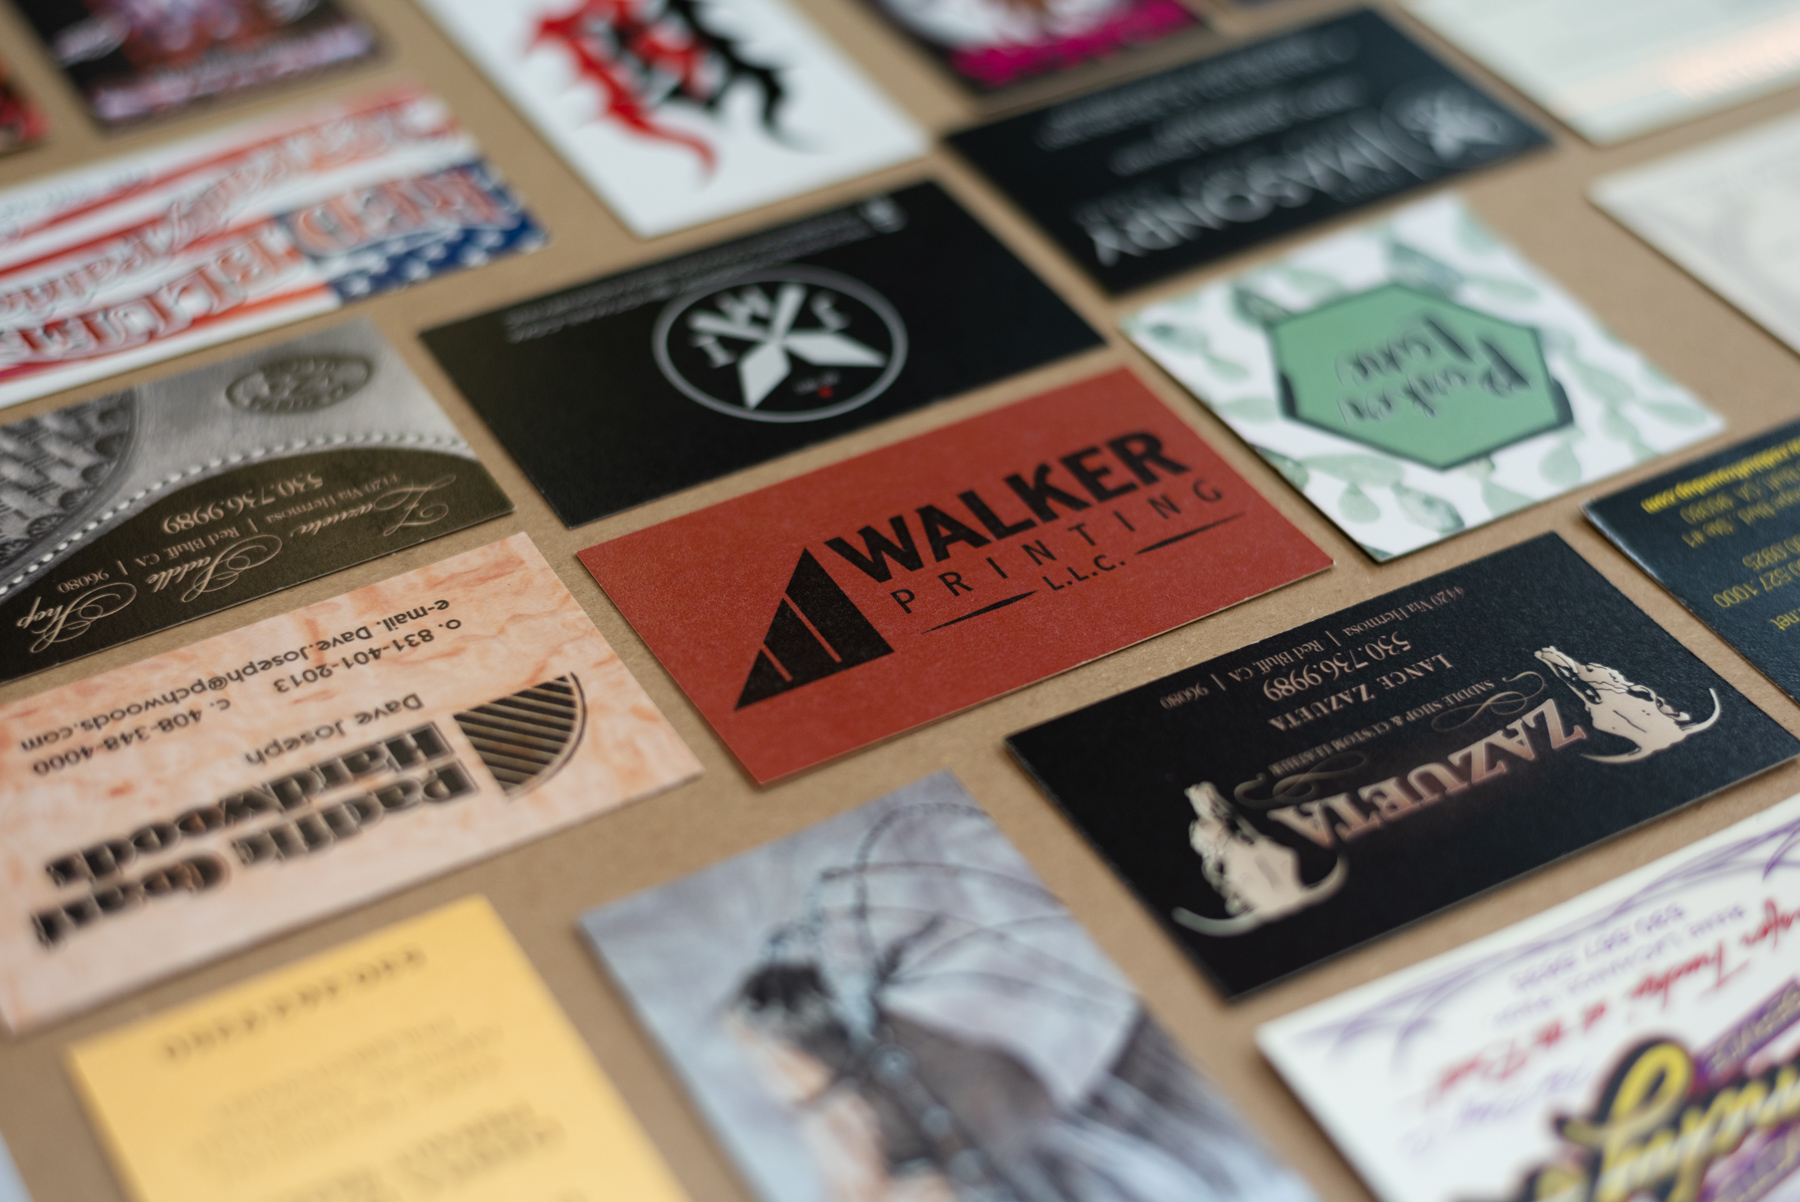 50cbaf021a34 Local One Stop Print Shop (530) 527-2142 – Walker Printing LLC